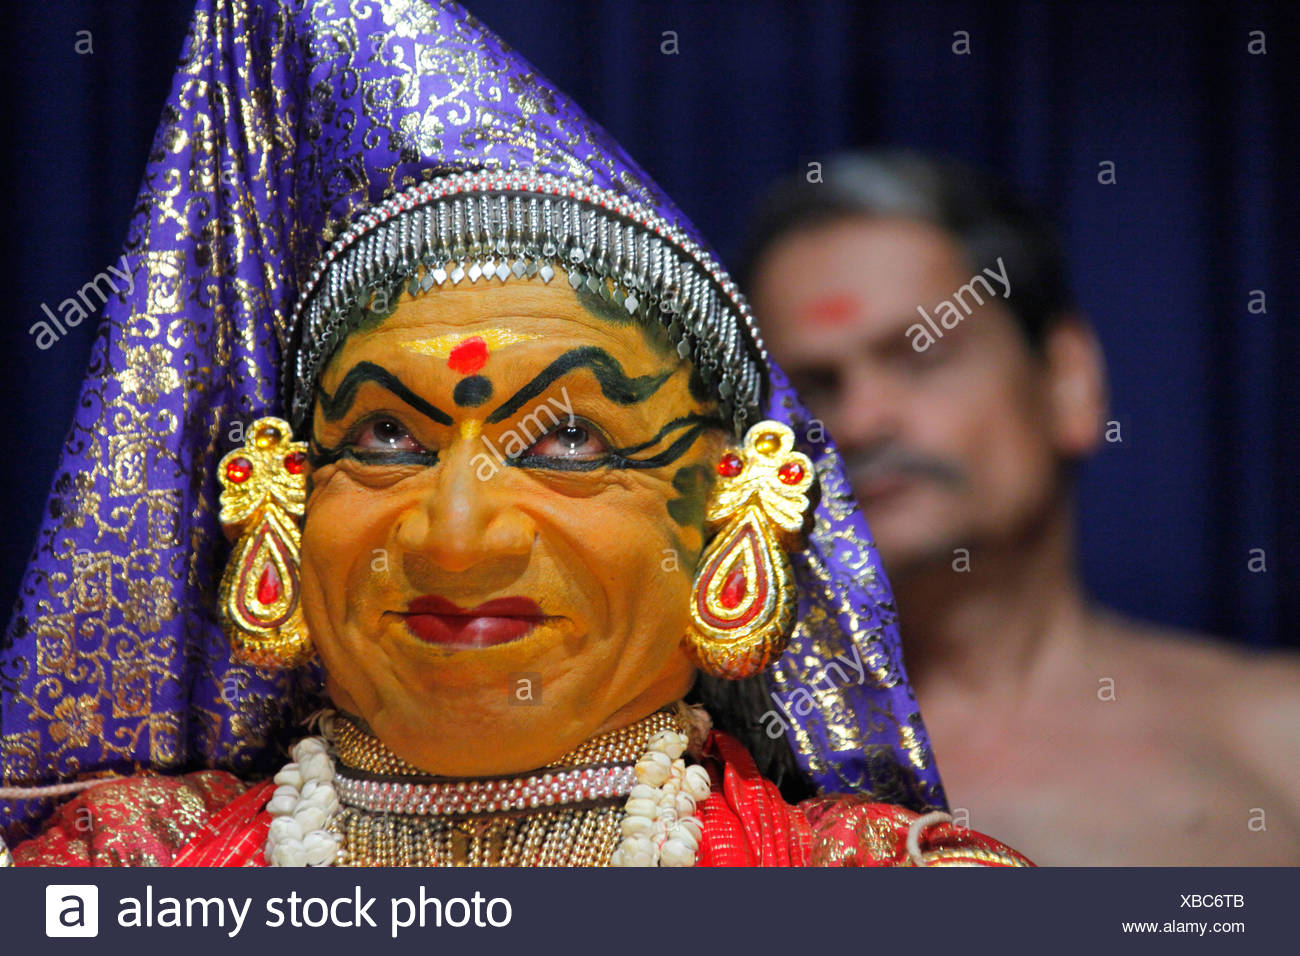 Kathakali, a classical Indian dance-drama, temple dance, Kerala Kathakali Centre, Kochi, Fort Cochin district, Ernakulam region - Stock Image